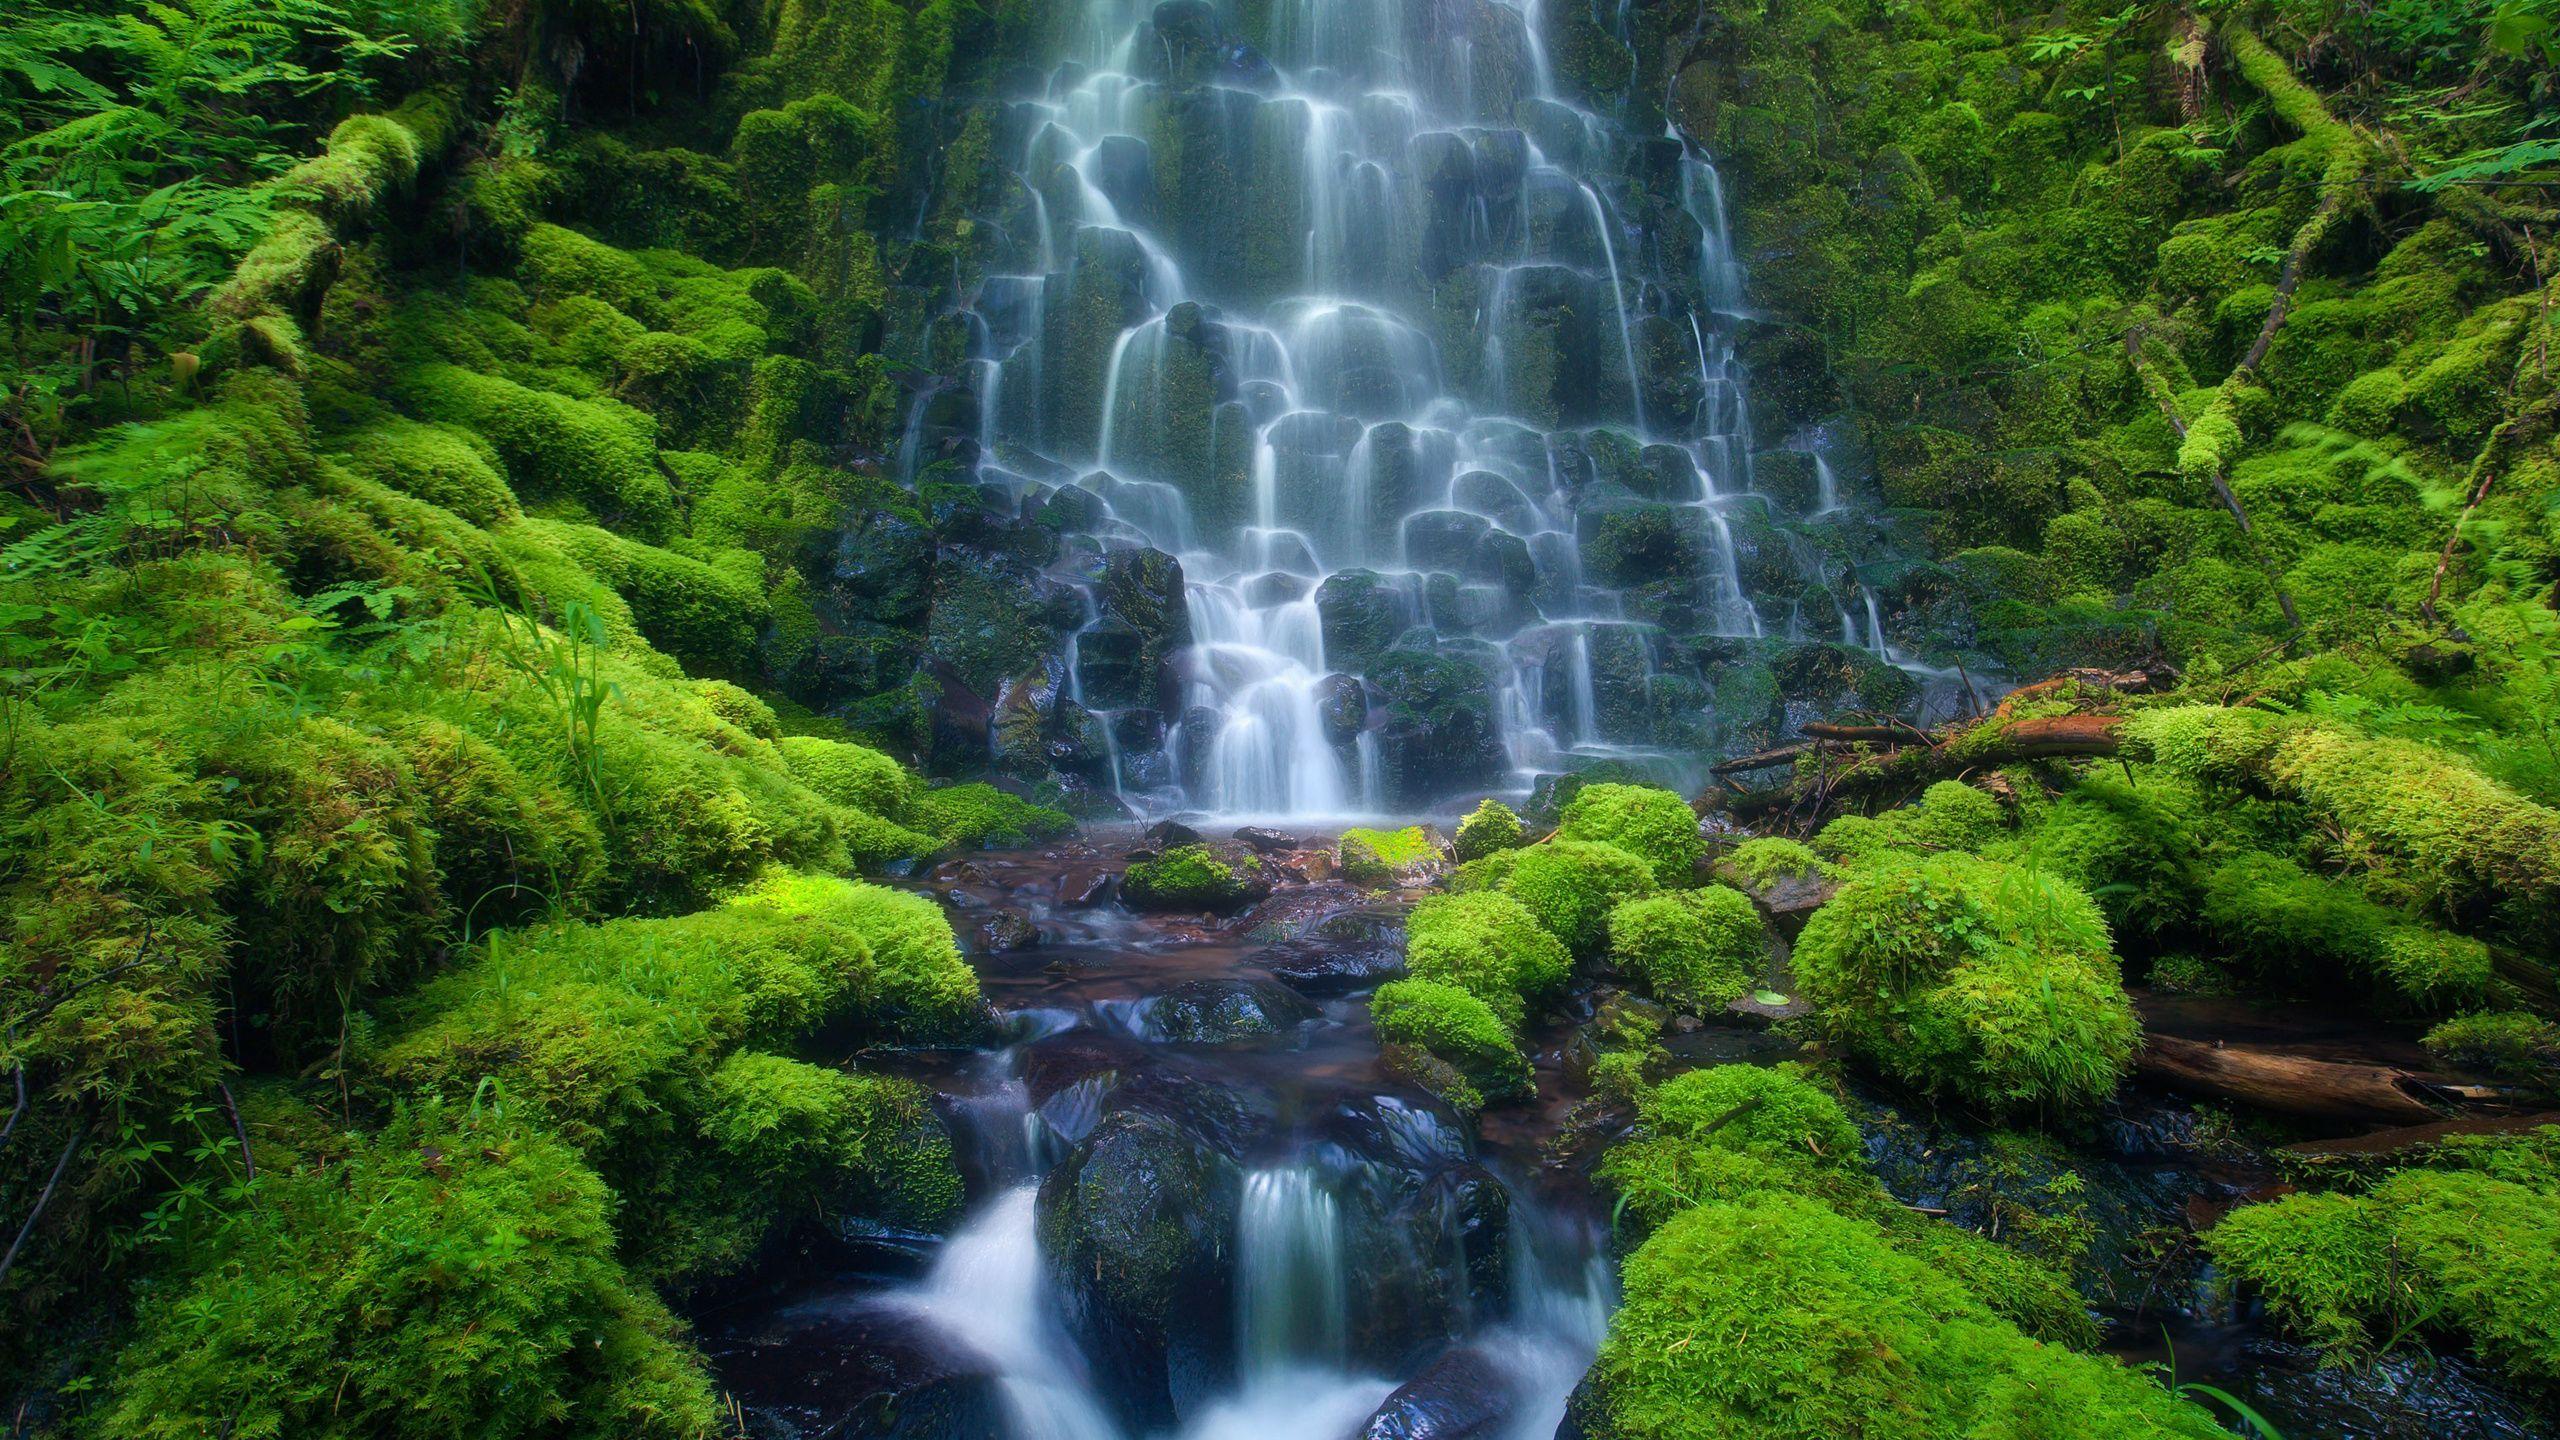 Pin by hdpicorner on Desktop Wallpapers | Waterfall wallpaper, Waterfall, Beautiful waterfalls